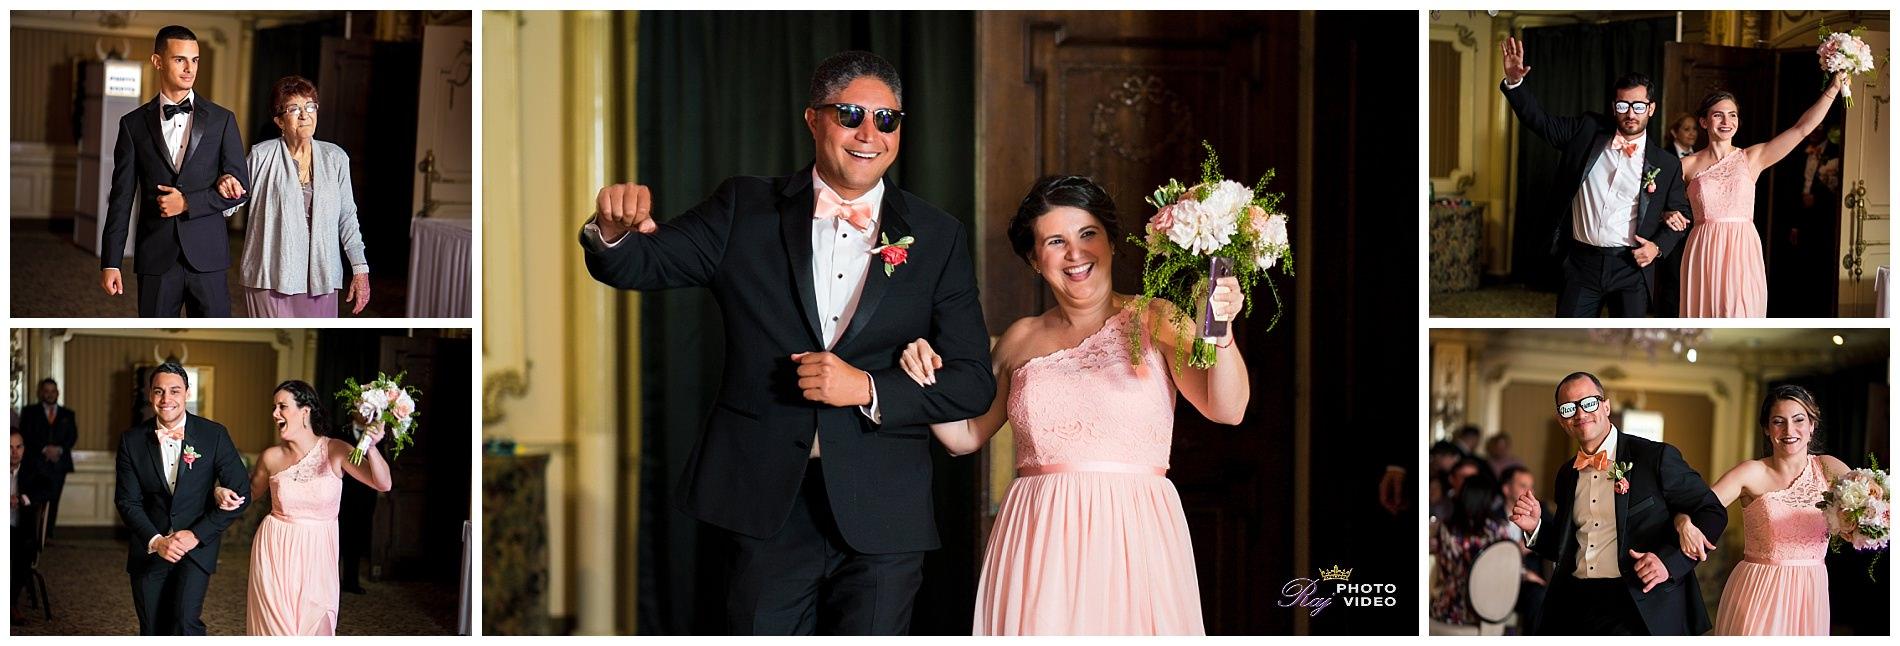 The-Manor-West-Orange-NJ-Wedding-Reception-Yanet-Jose-15.jpg